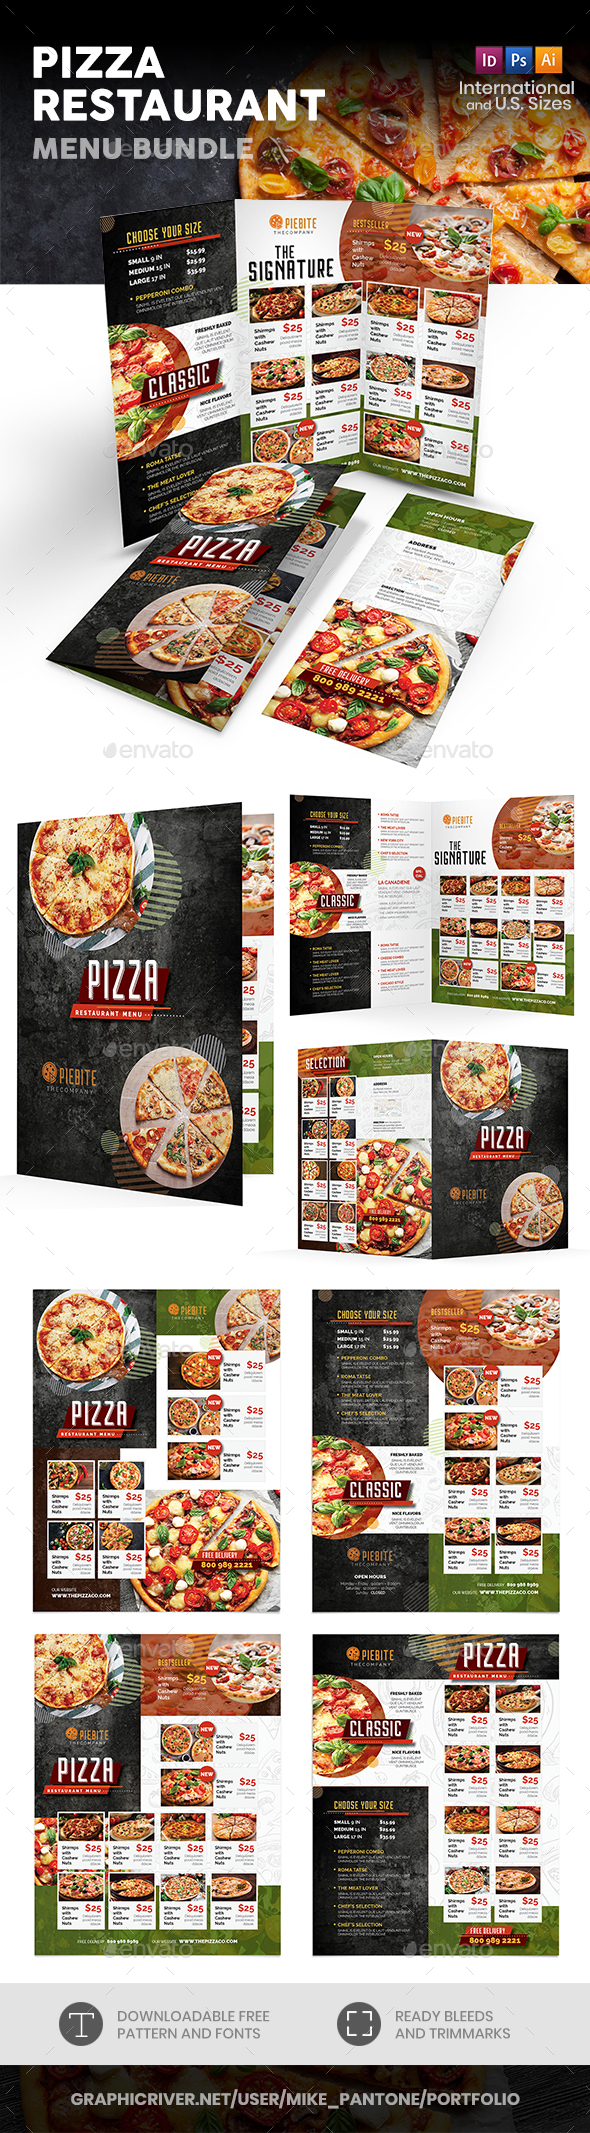 pizza restaurant menu print bundle 3 by mike pantone graphicriver